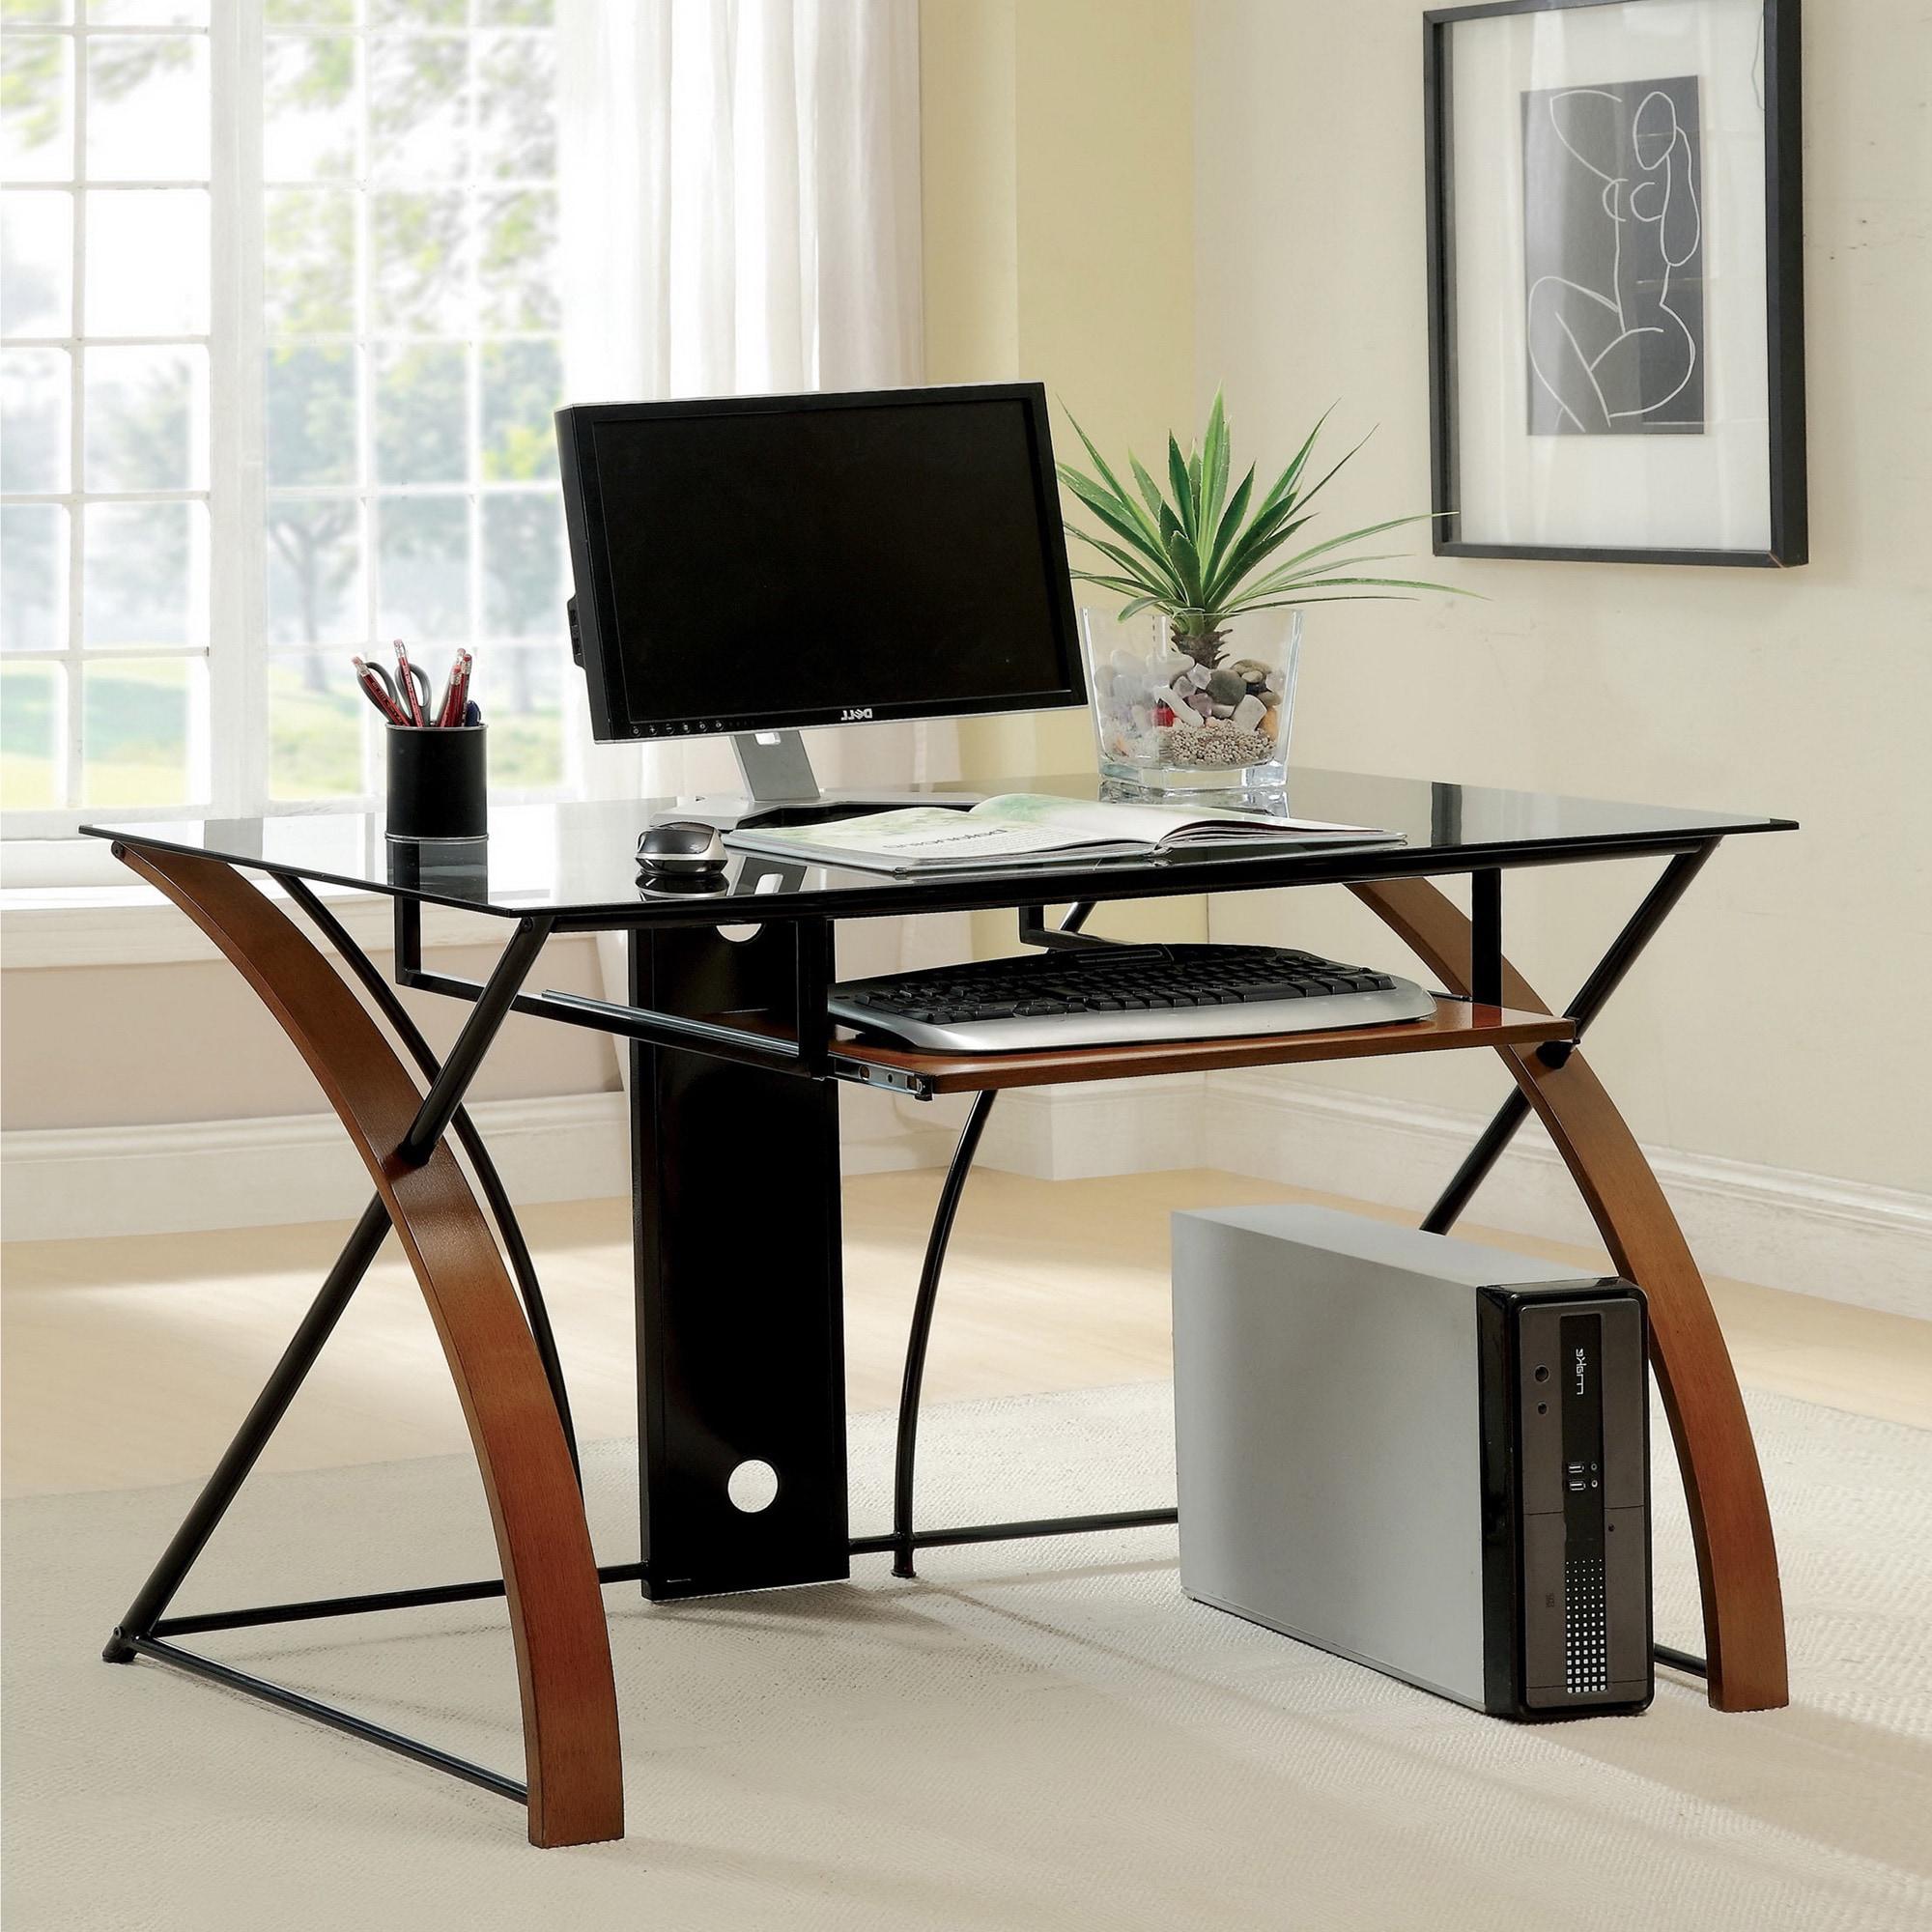 Gl Desks Computer Tables Online At Our Best Home Office Furniture Deals